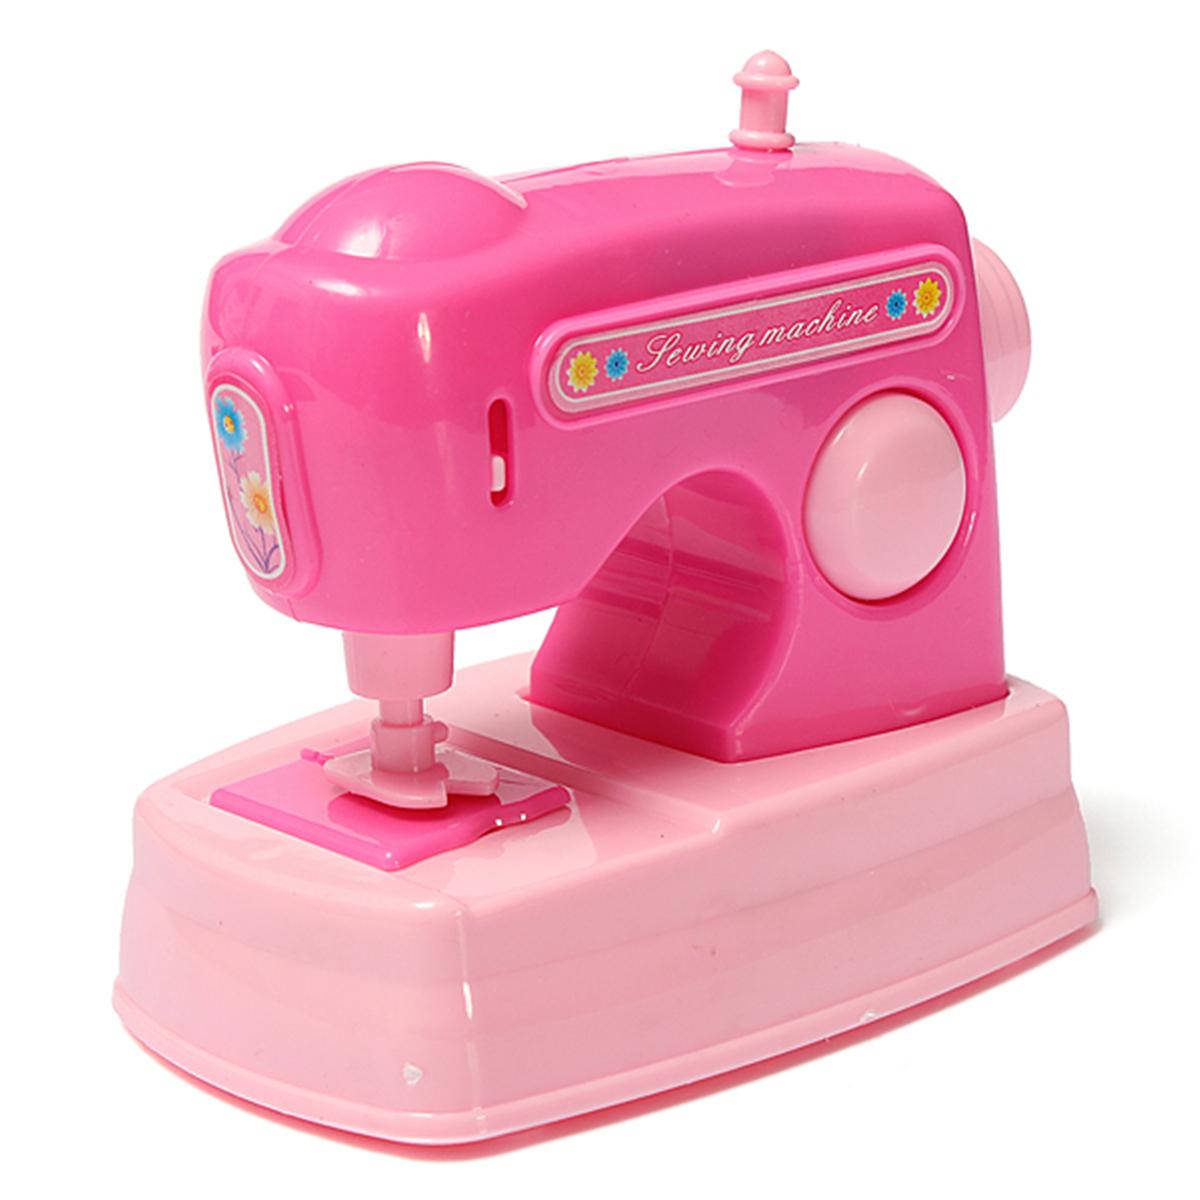 Ebay Toy Kitchen Appliances